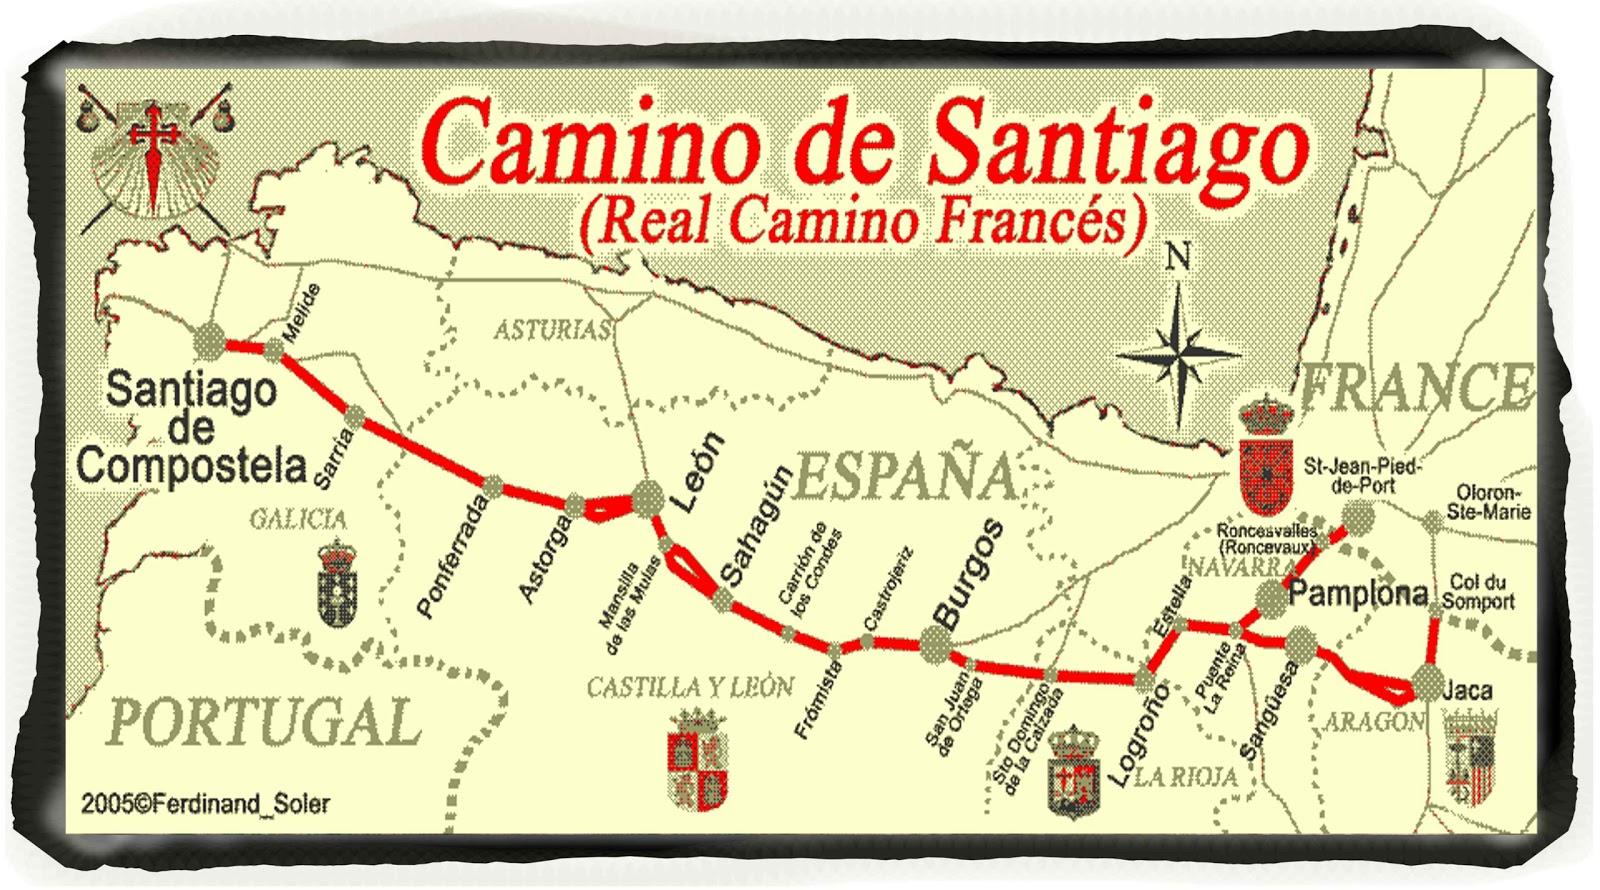 Camino de santiago 800 project - St jean pied de port to santiago distance ...